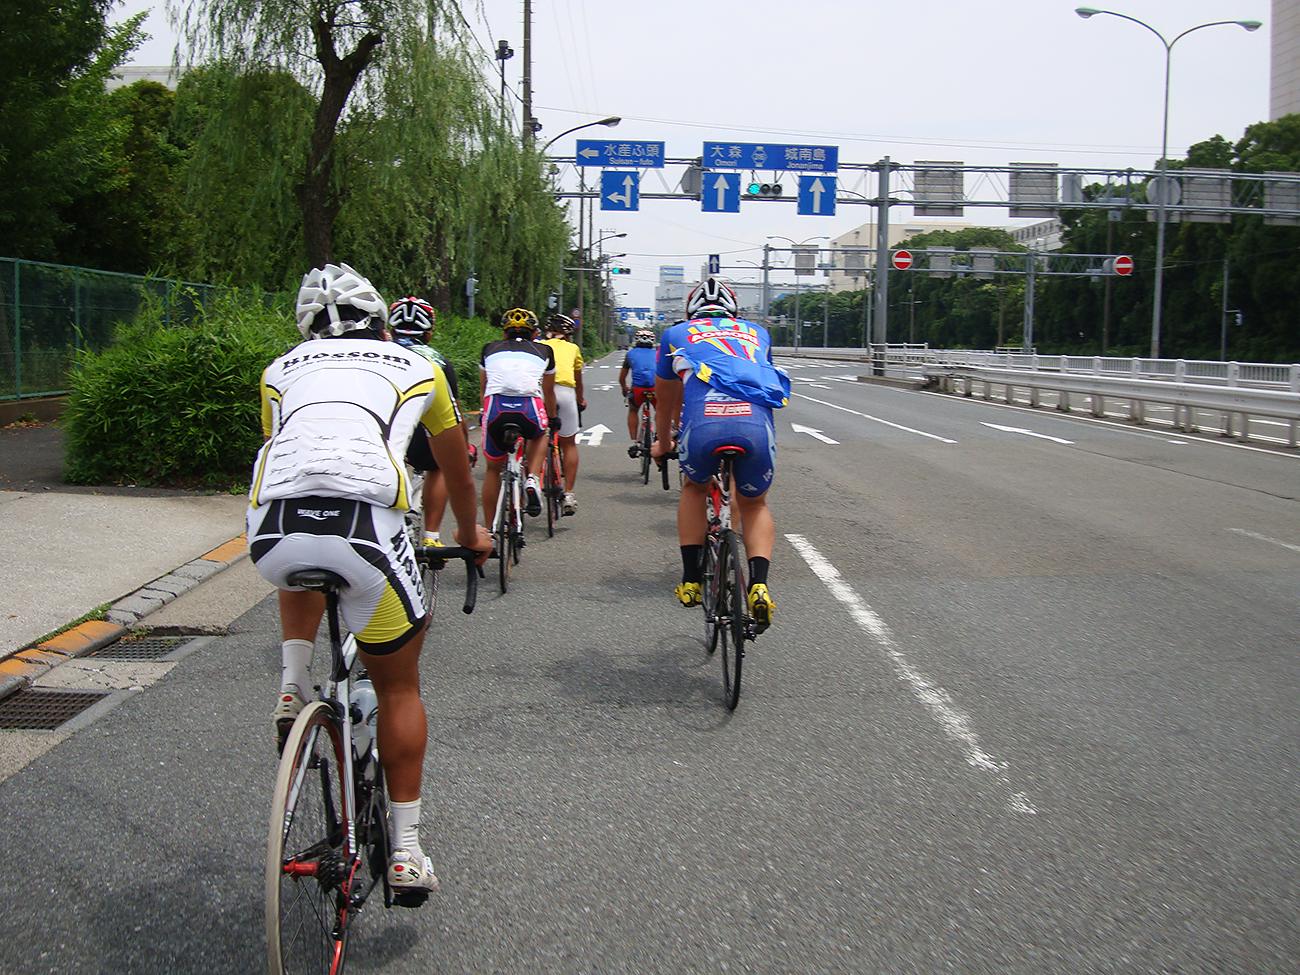 http://moritetsu.info/bicycle/img/w05-ooi-bs-DSC06969.jpg